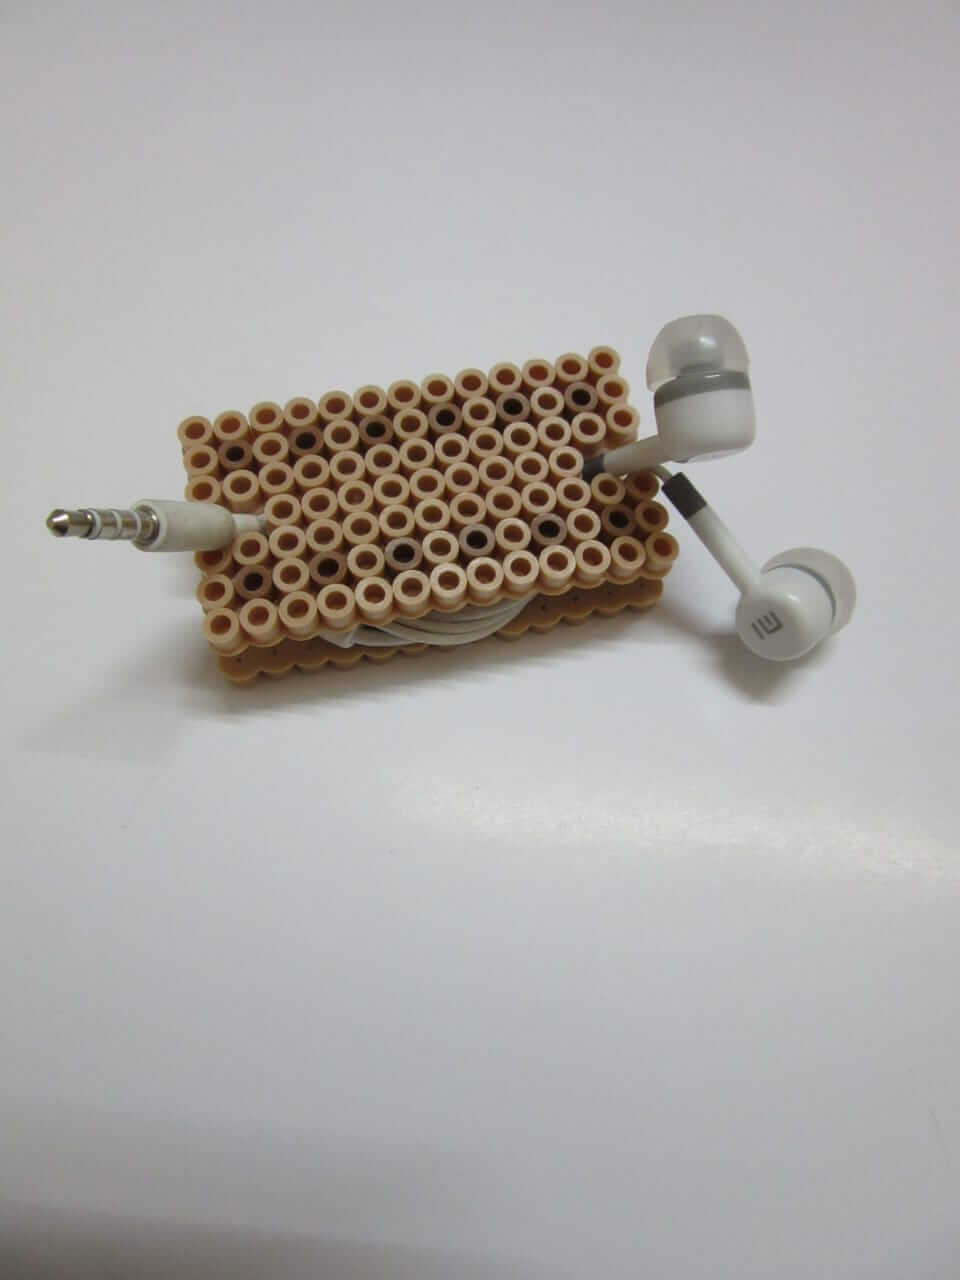 BISCUIT HEADPHONE HOLDER